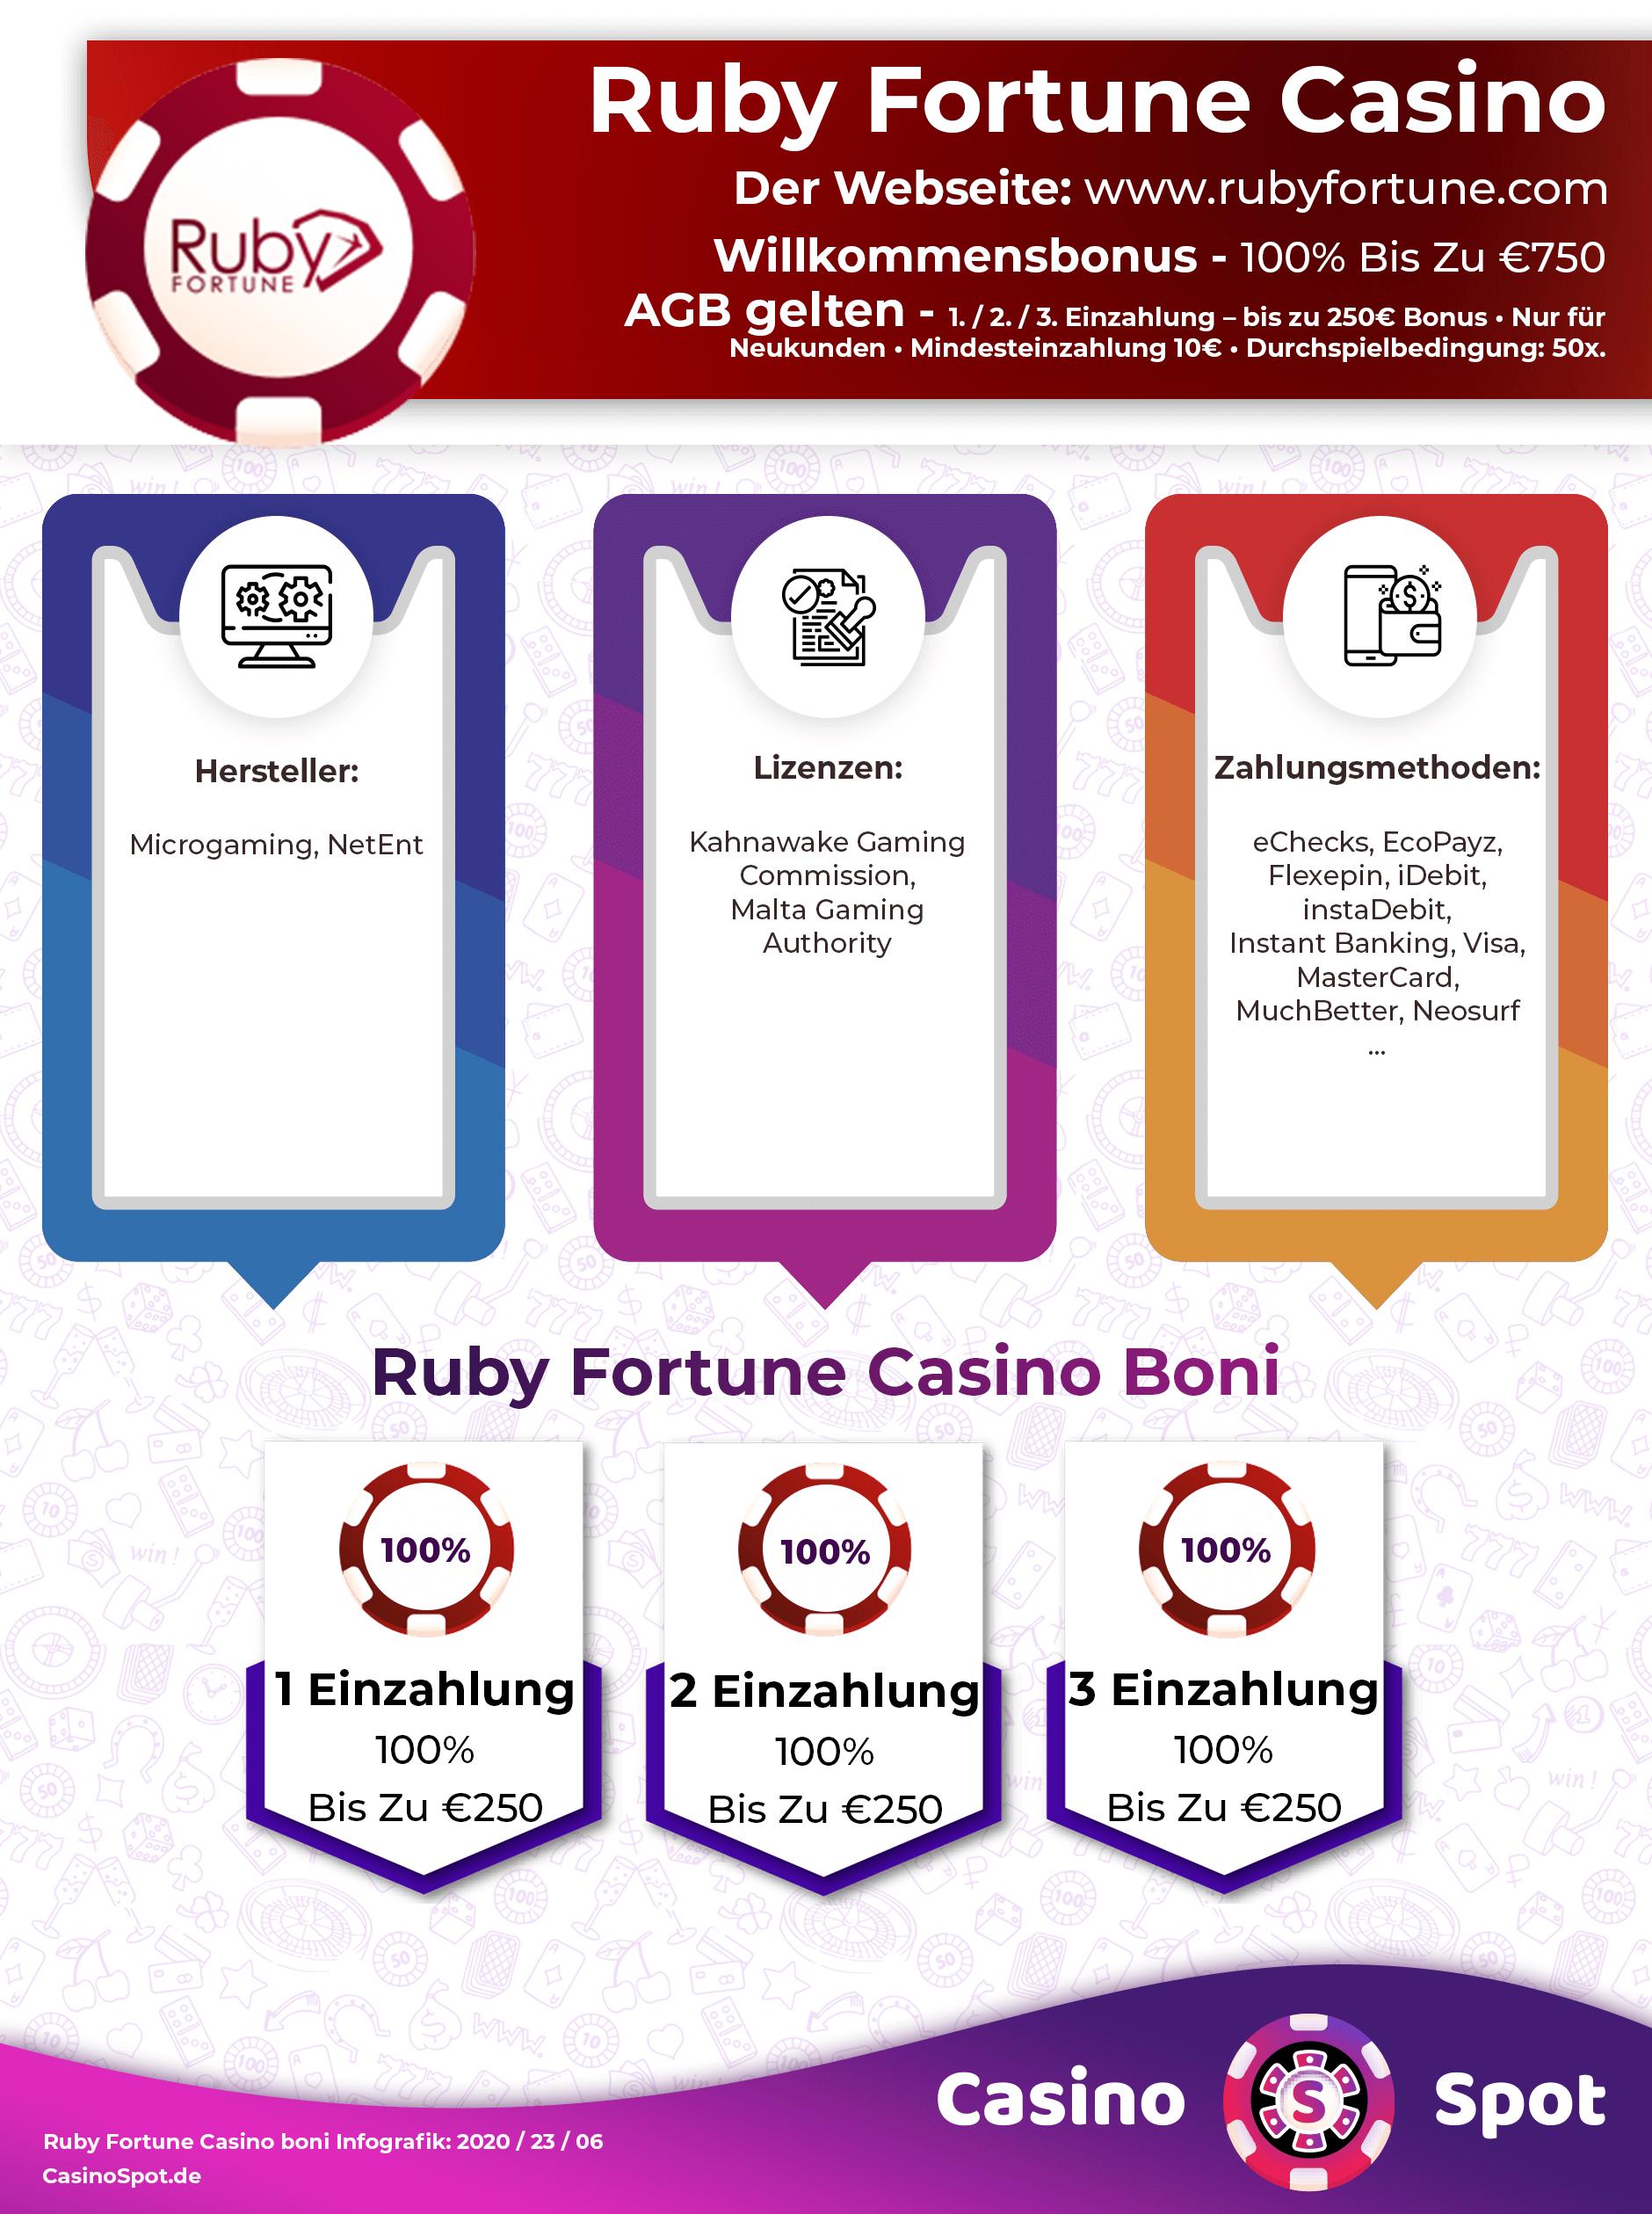 Ruby Fortune Casino Bonus Code